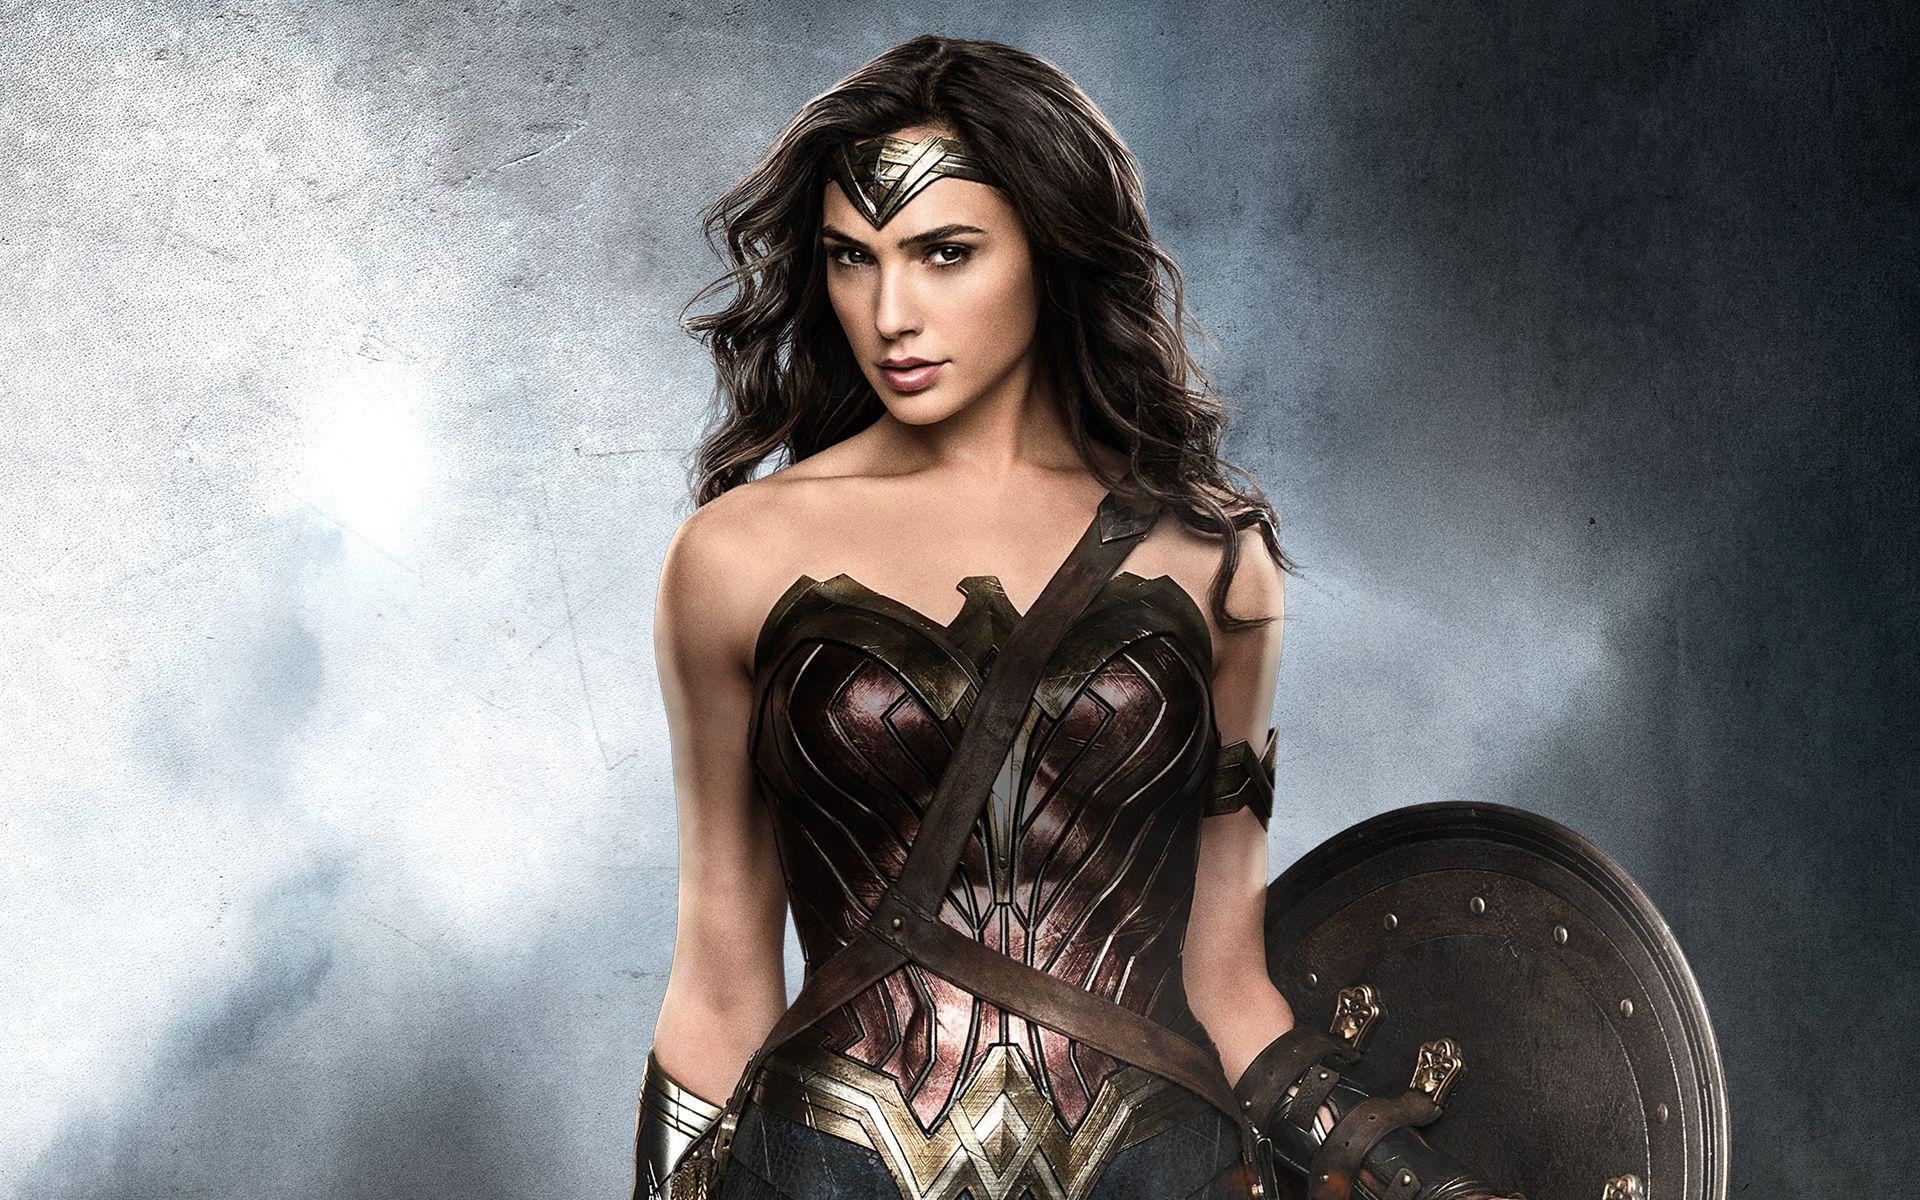 Wonder Woman Gal Gadot Wallpapers | HD Wallpapers